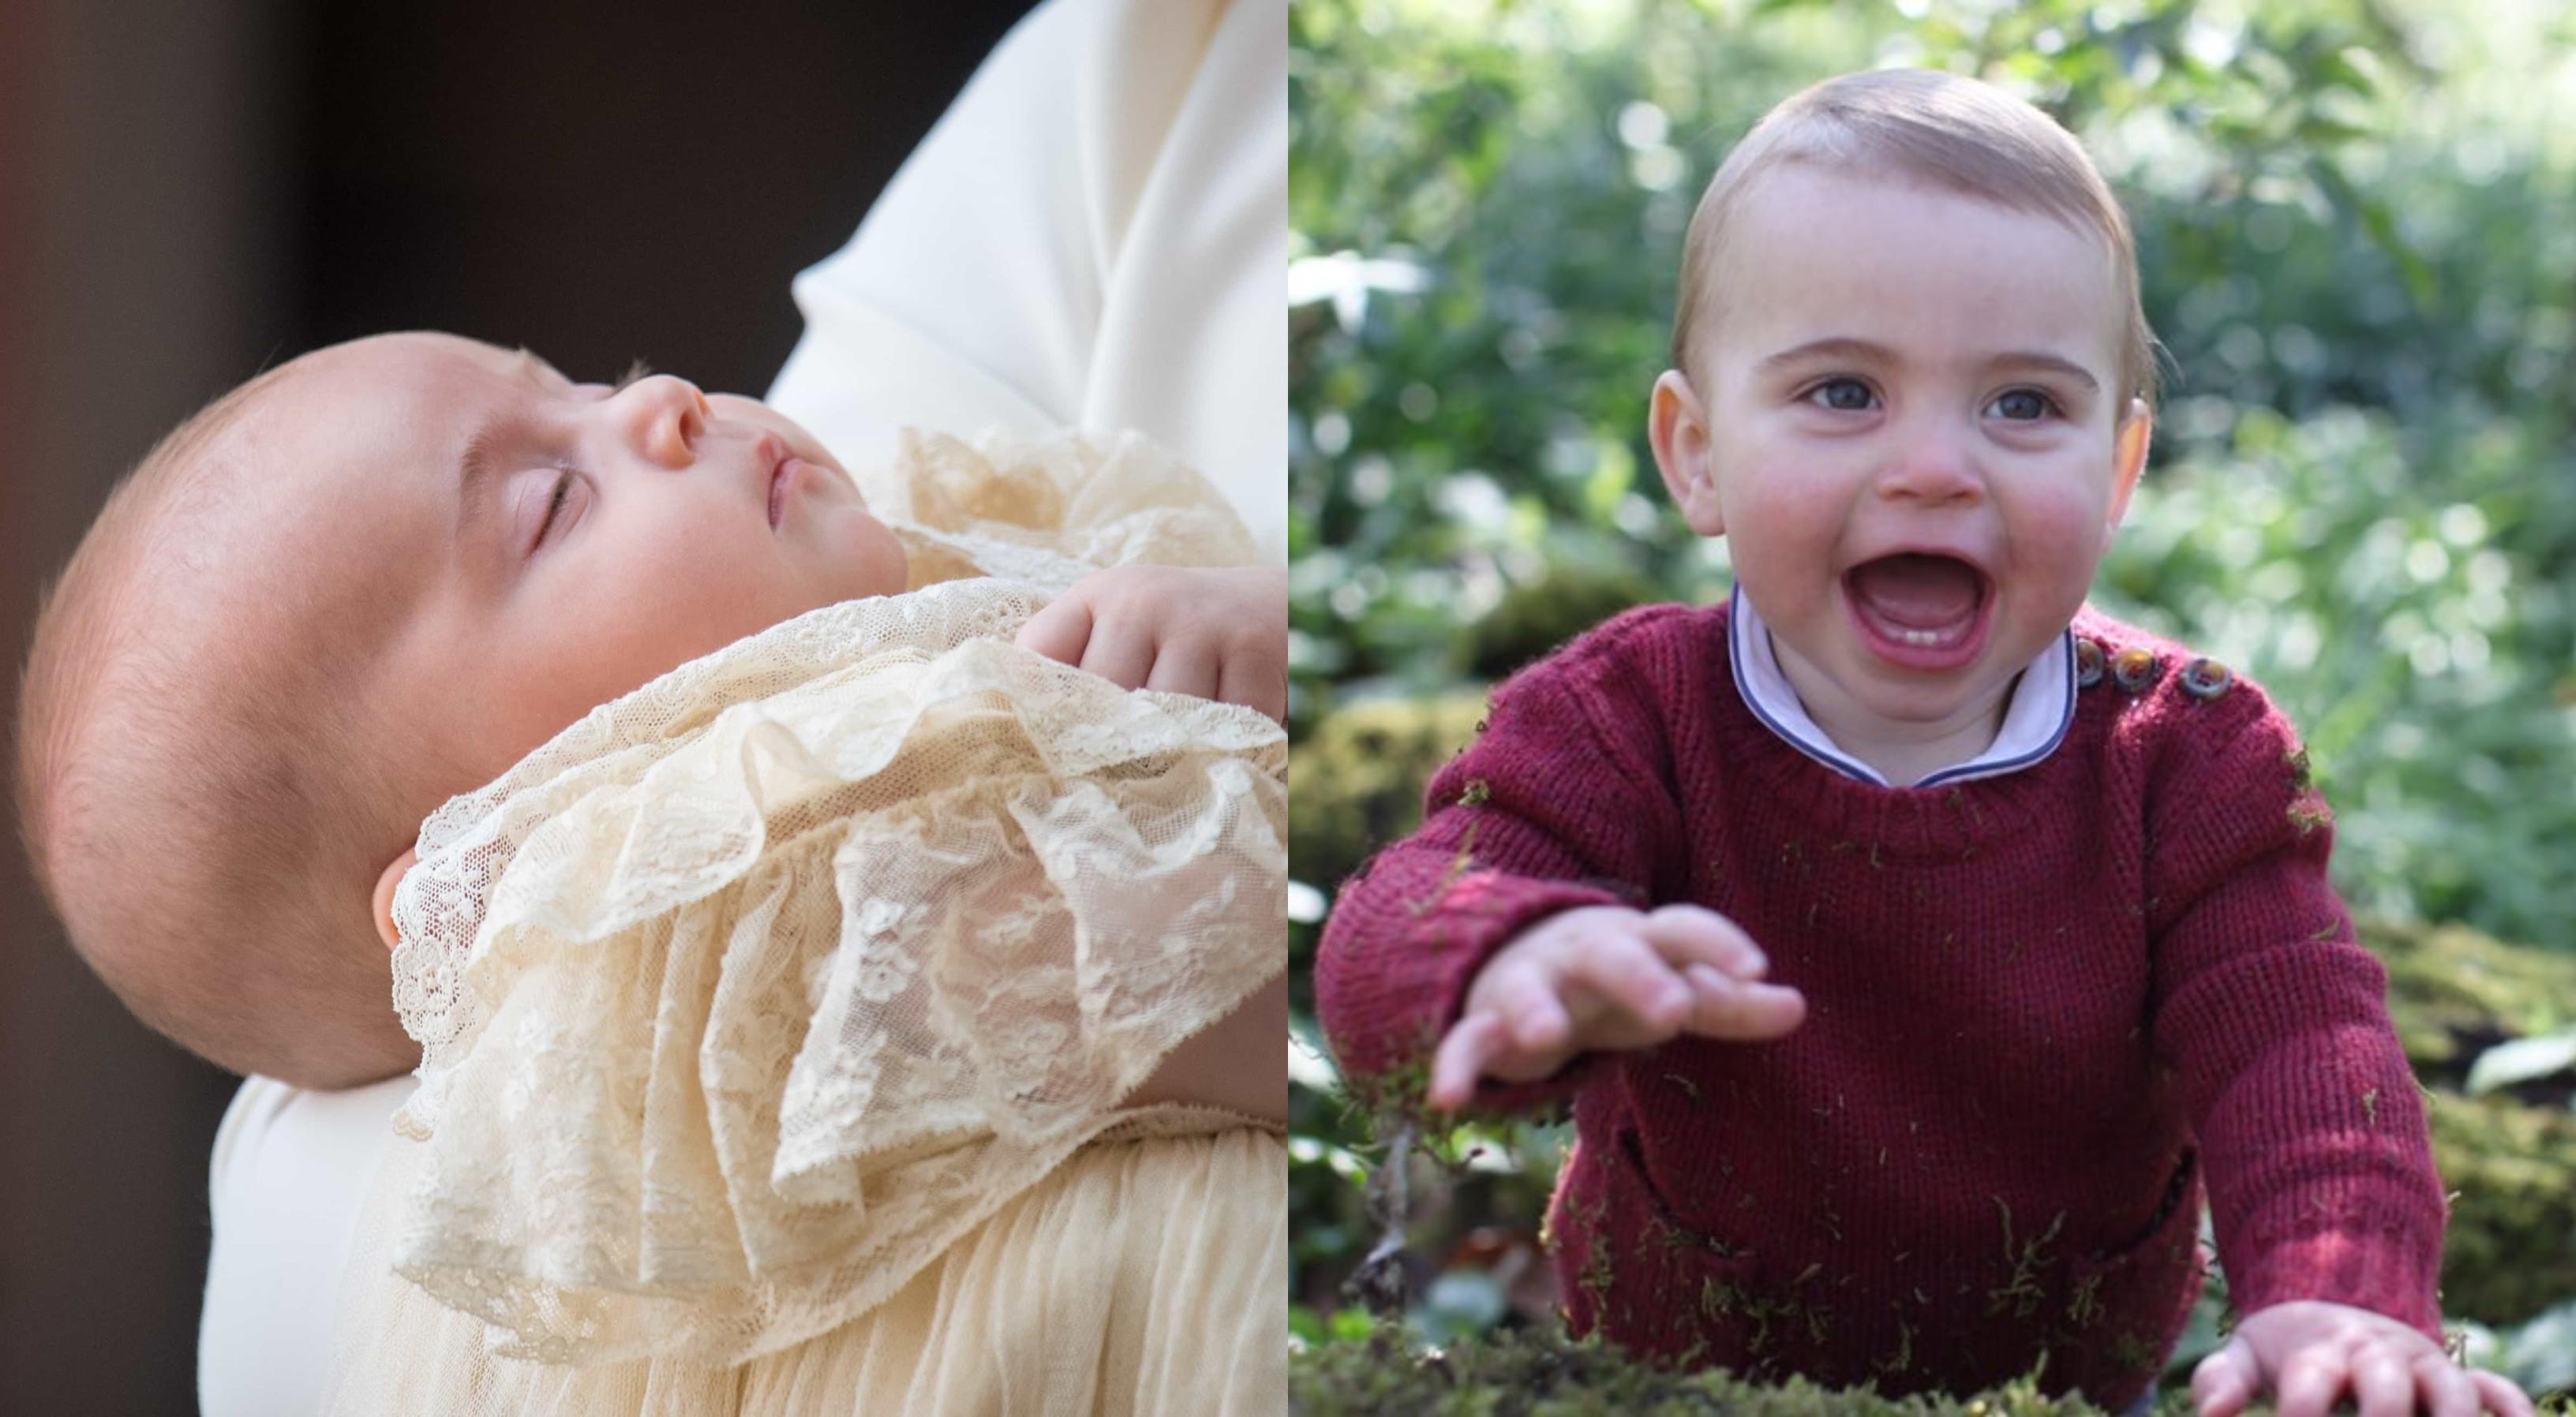 Como o pequeno Louis cresceu... Família real partilha fotos do príncipe